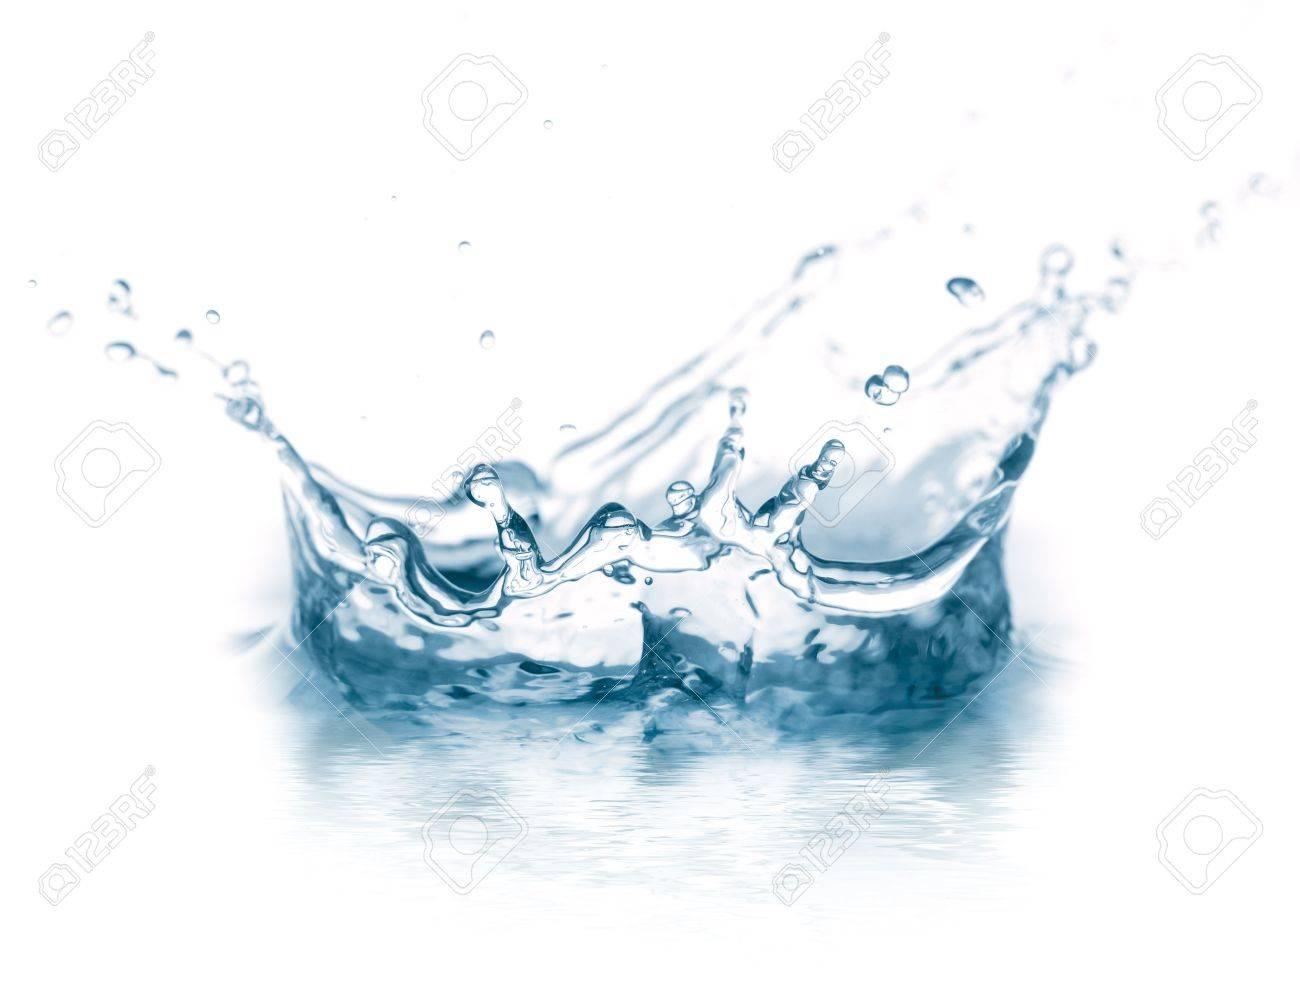 water splash isolated on white Stock Photo - 6722996